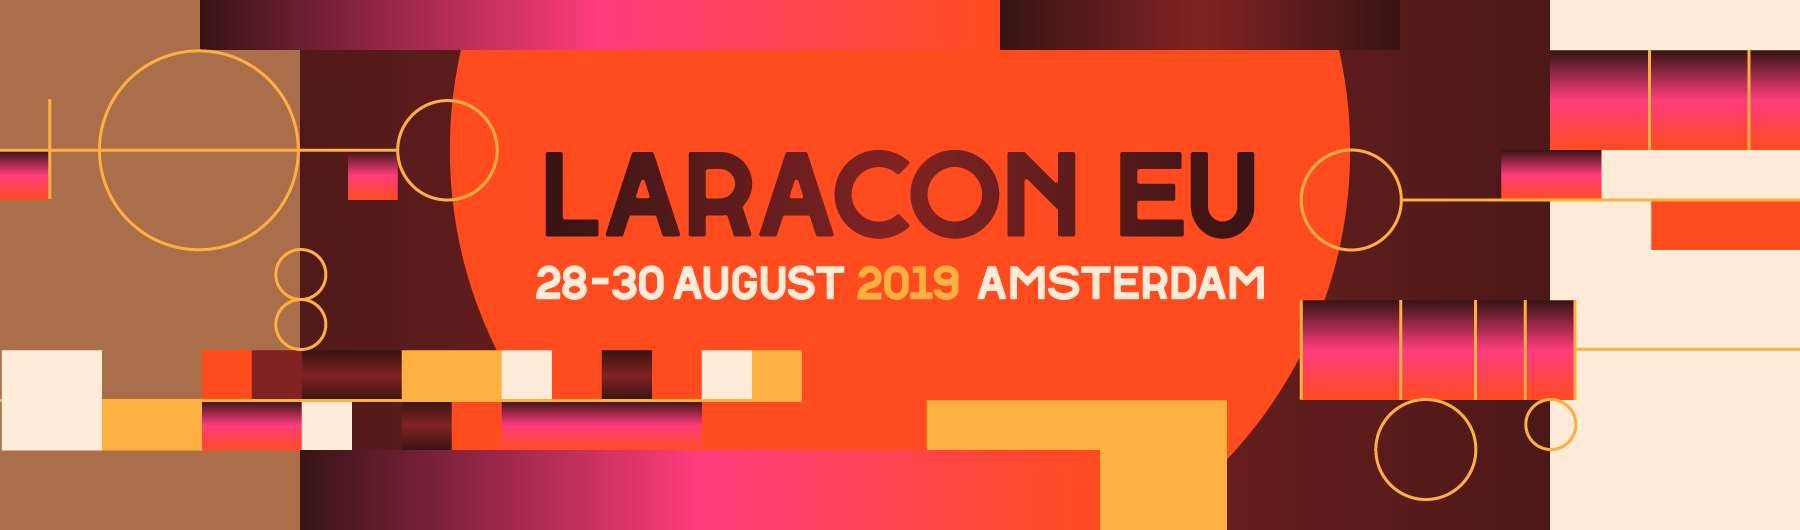 Laracon EU Amsterdam 2019